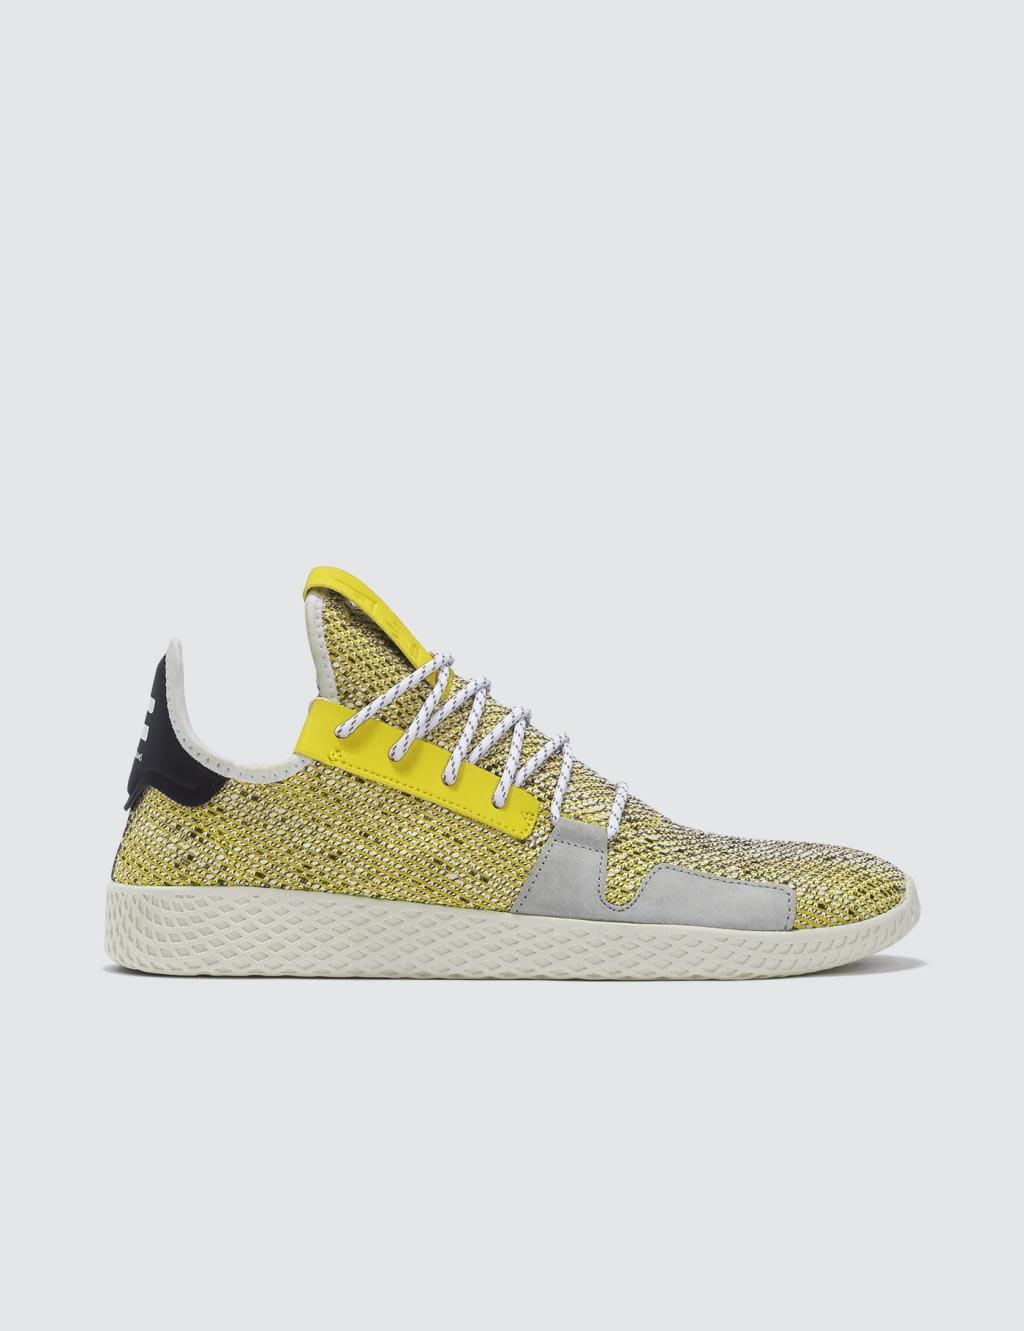 Pharrell williams x comprare originali adidas originali adidas solare hu